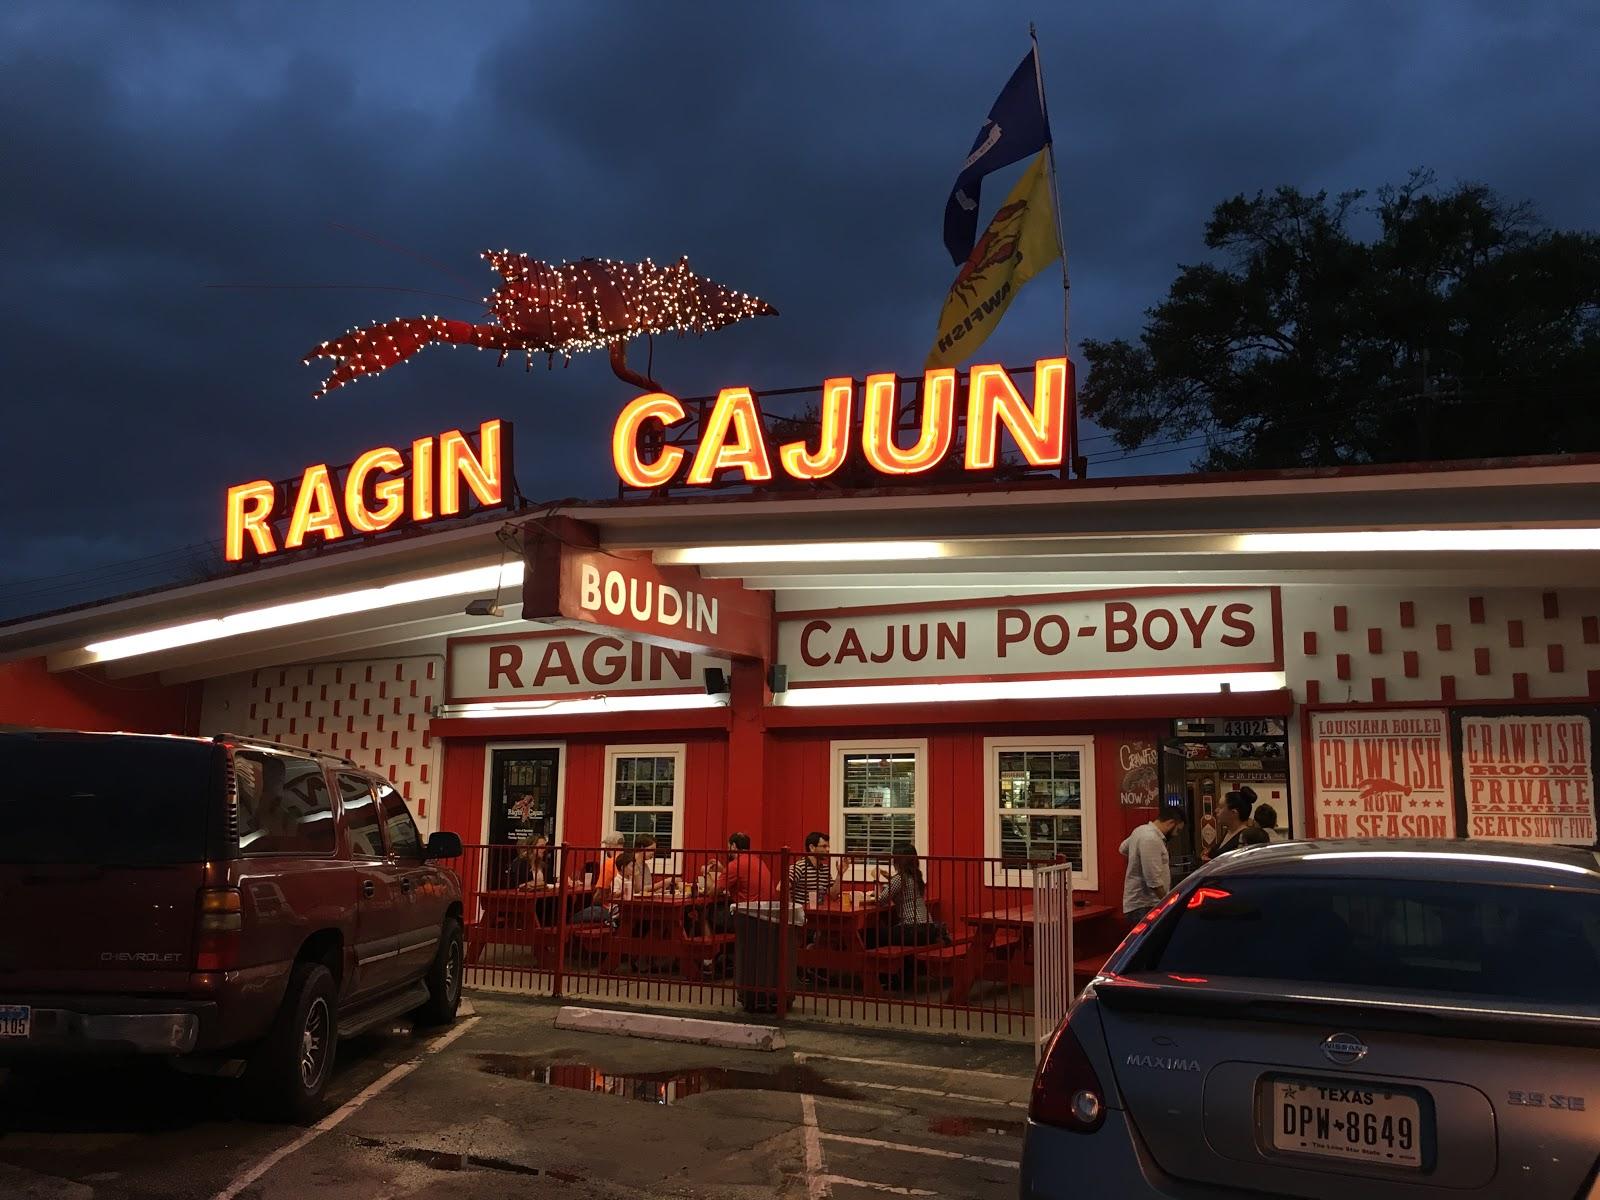 Ragin Cajun crawfish seafood Gulf shrimp oysters